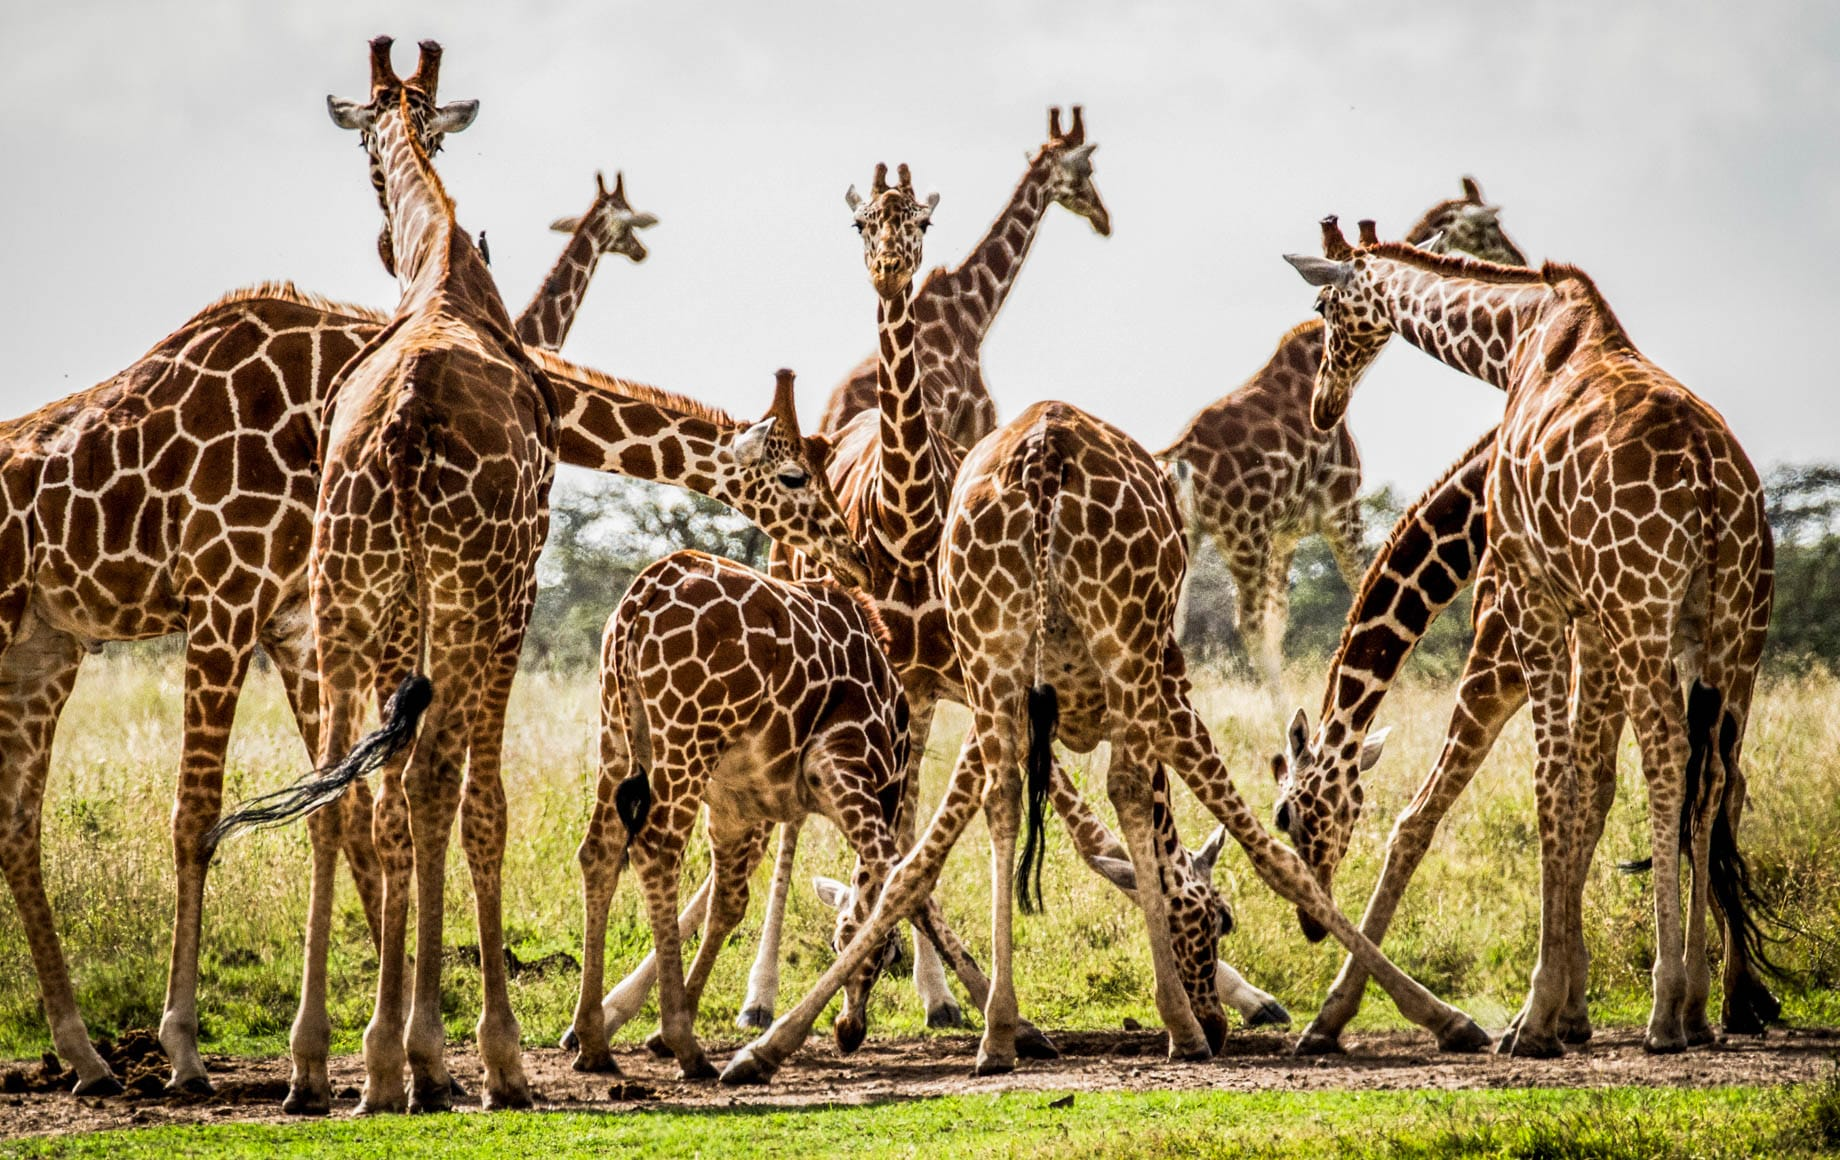 Group of Giraffes Laikipia Plateau